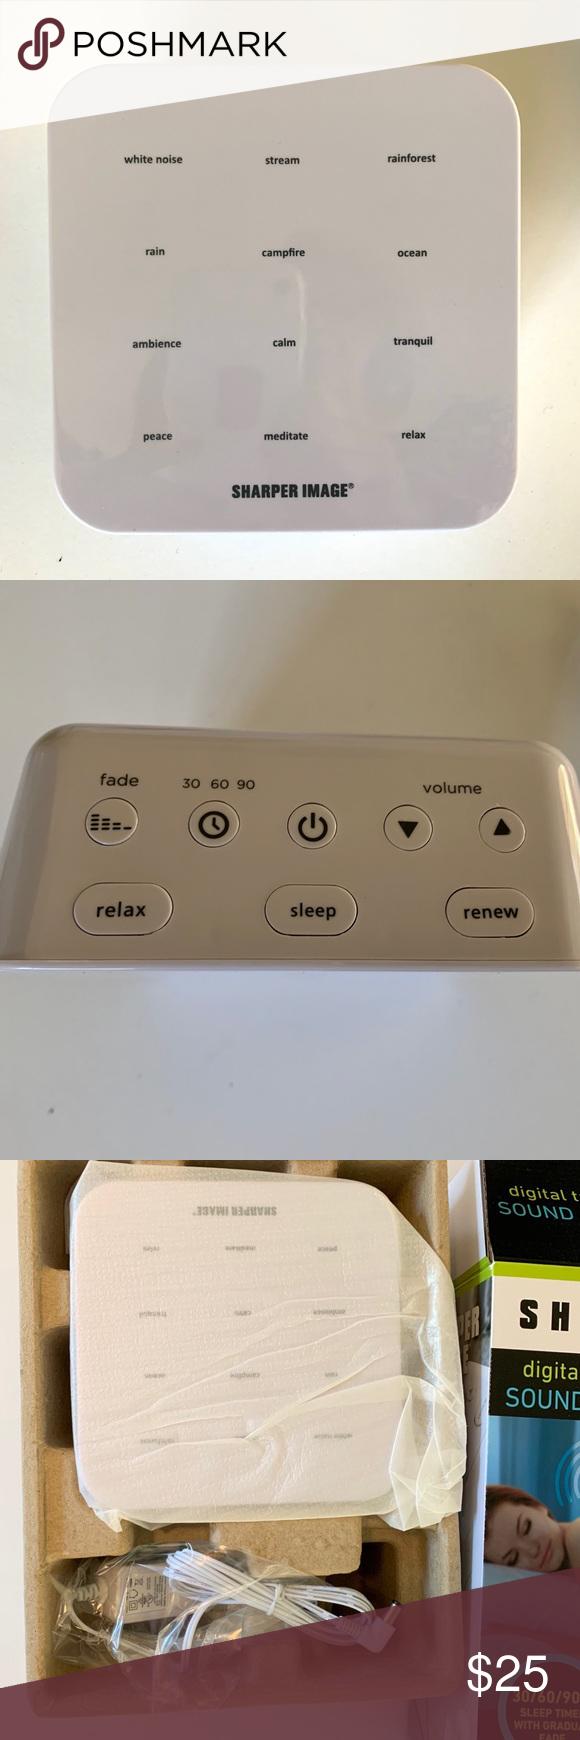 Sharper Image Digital Ultimate Sleep Sound Machine NWOT